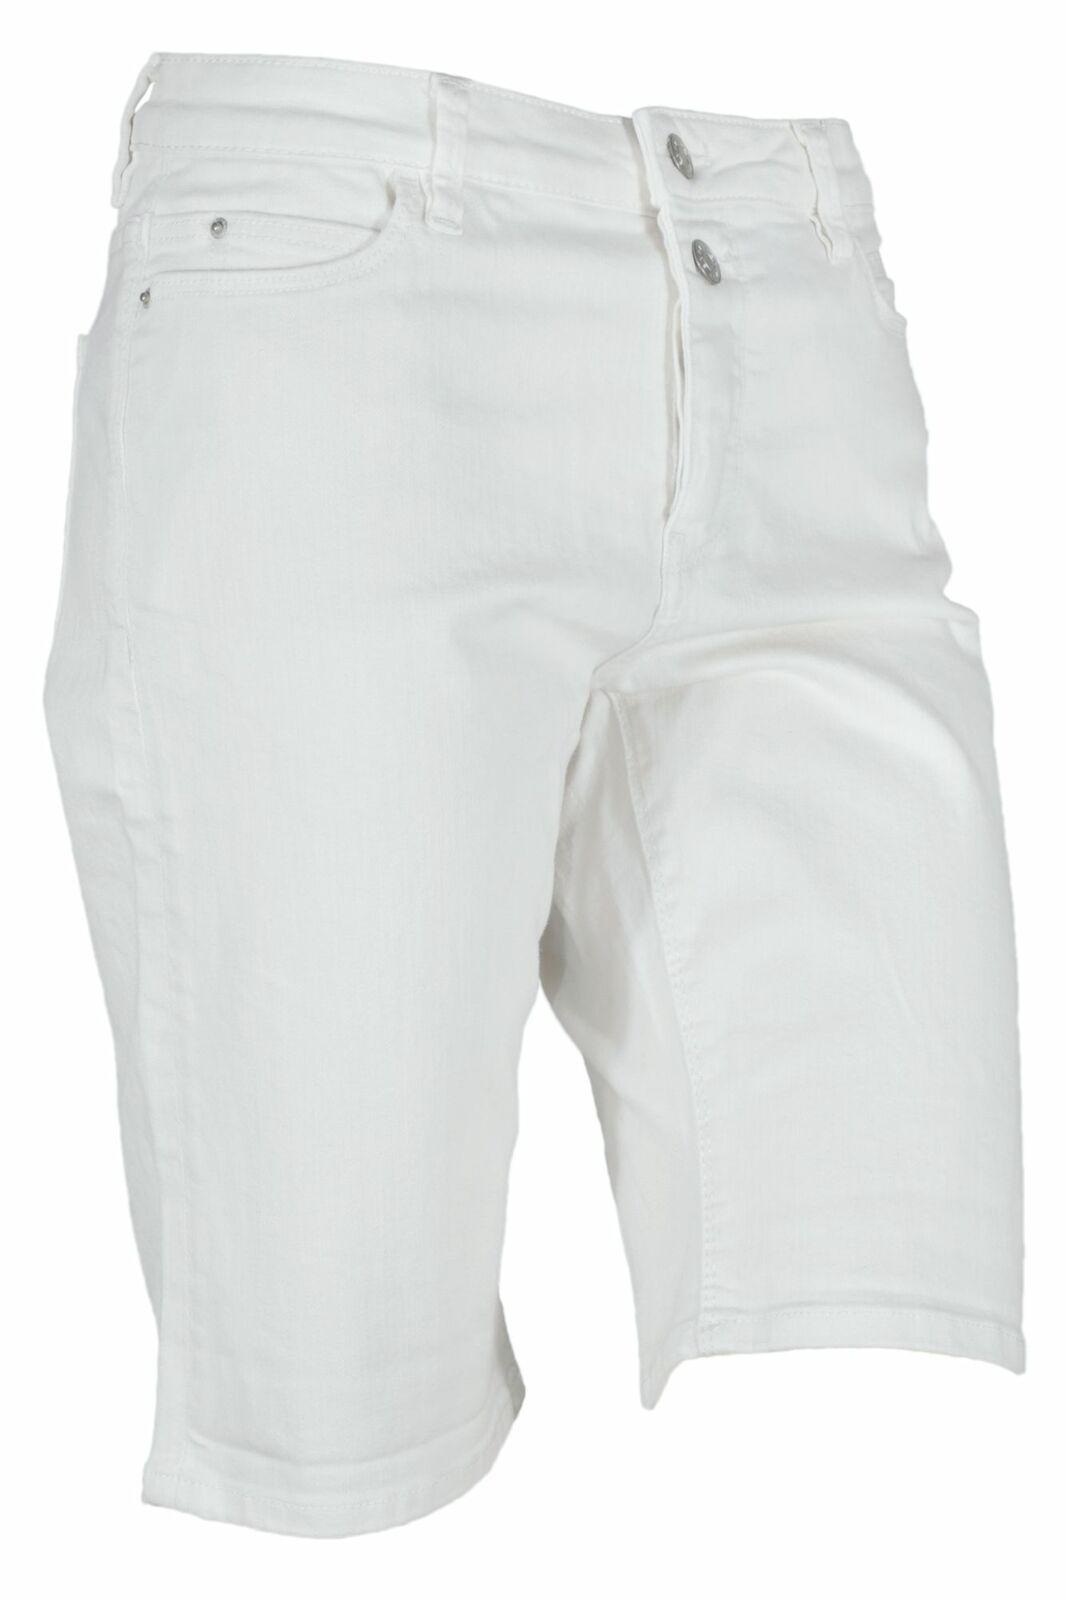 Esprit Jeansshorts Bermuda Shorts Kurze Hose Stretch Damen Weiß Regular Fit